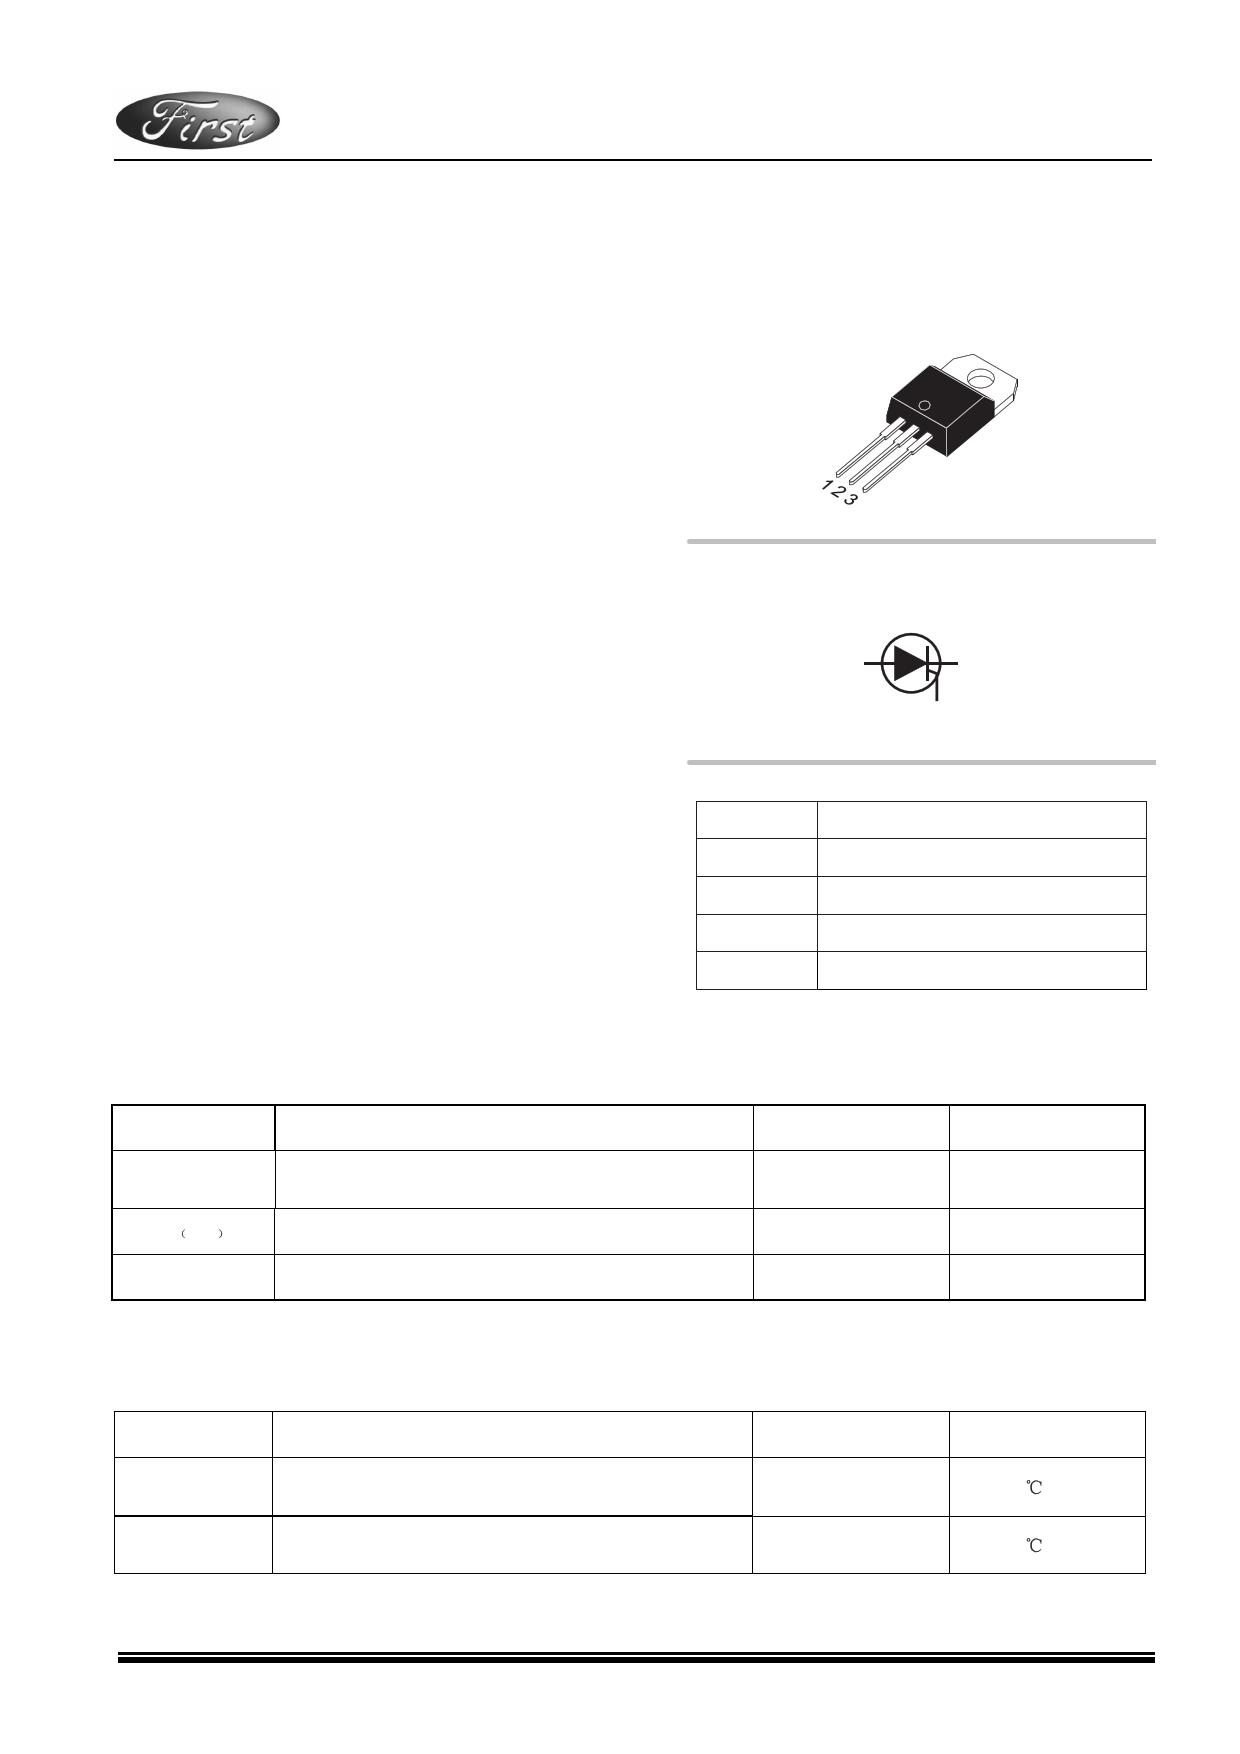 TS820-600TG Datasheet